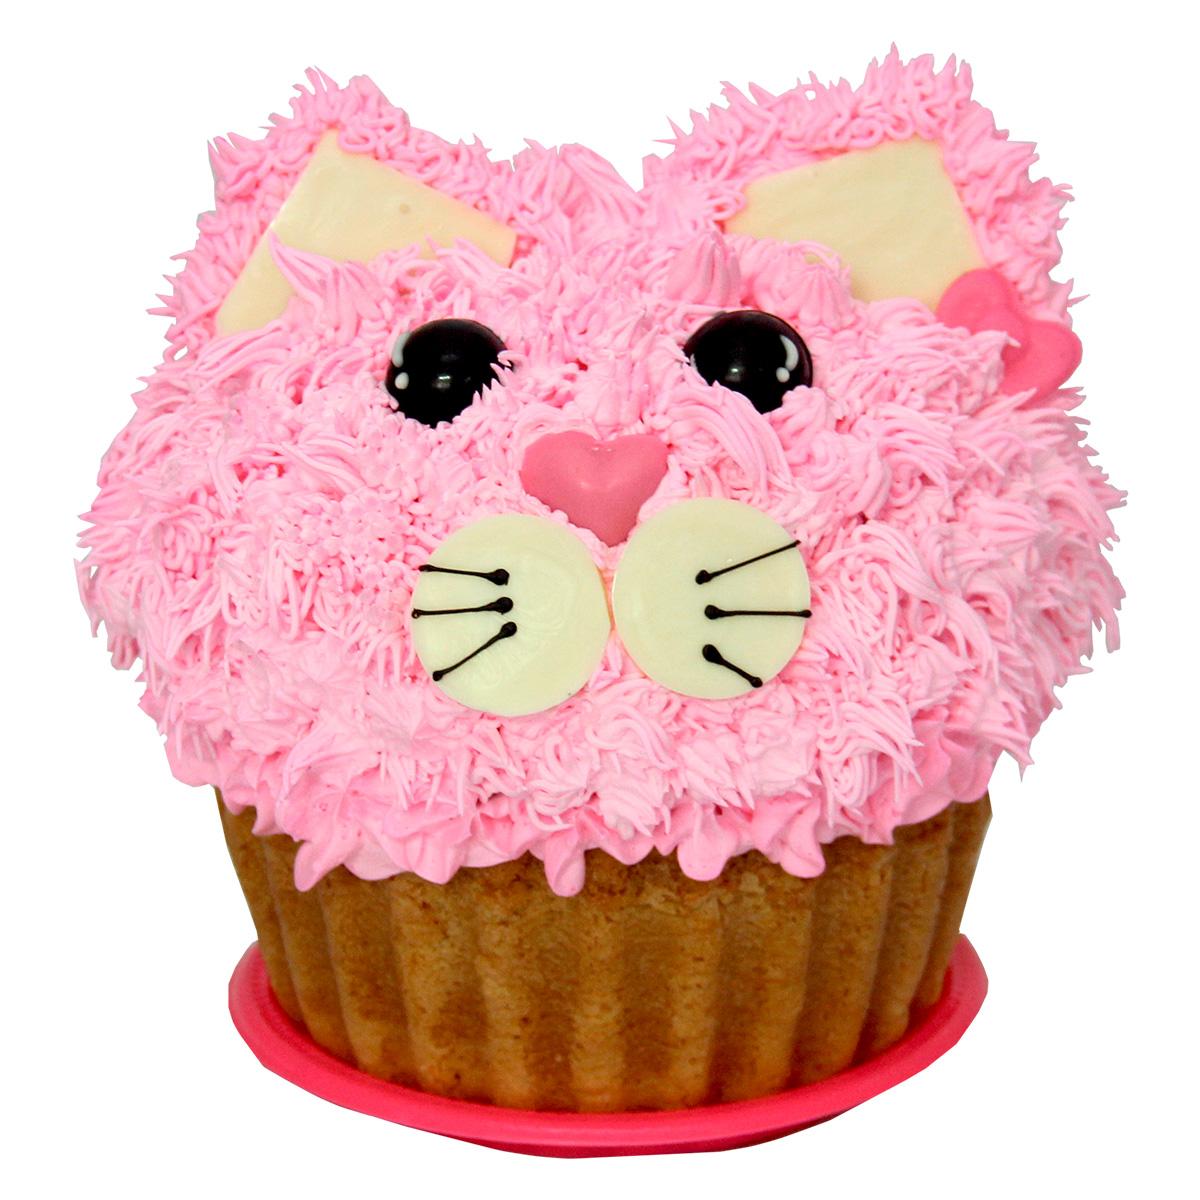 Cupcake gigante decoraci n gatico almara reposteria for Decoracion en cupcakes